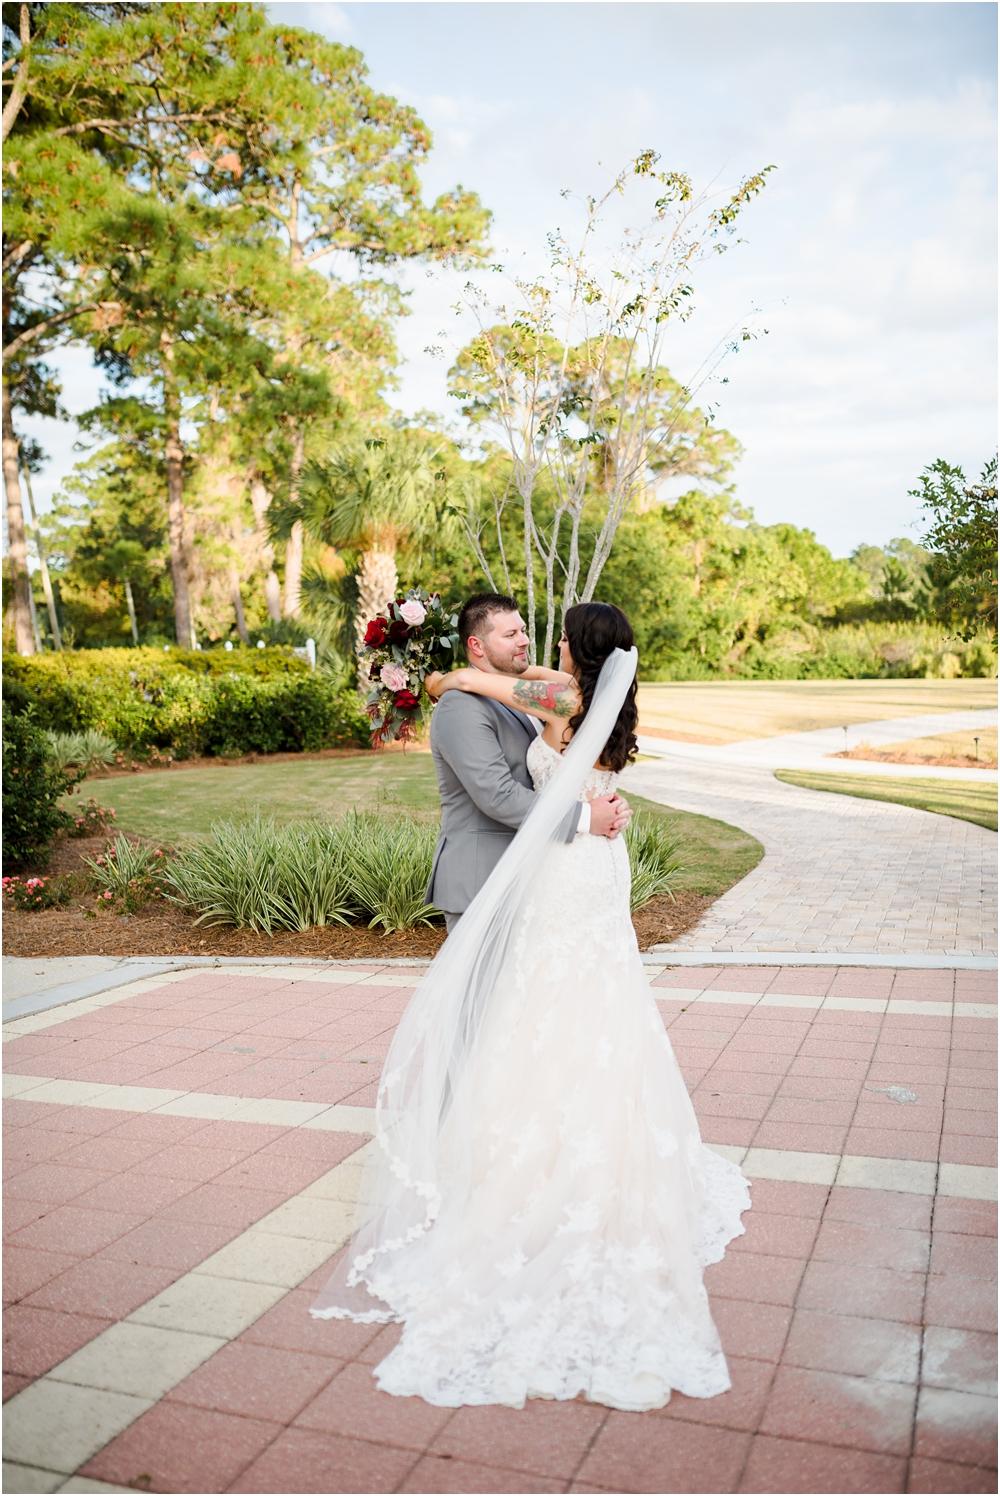 imhof-sheraton-panama-city-beach-florida-wedding-photographer-kiersten-grant-100.jpg